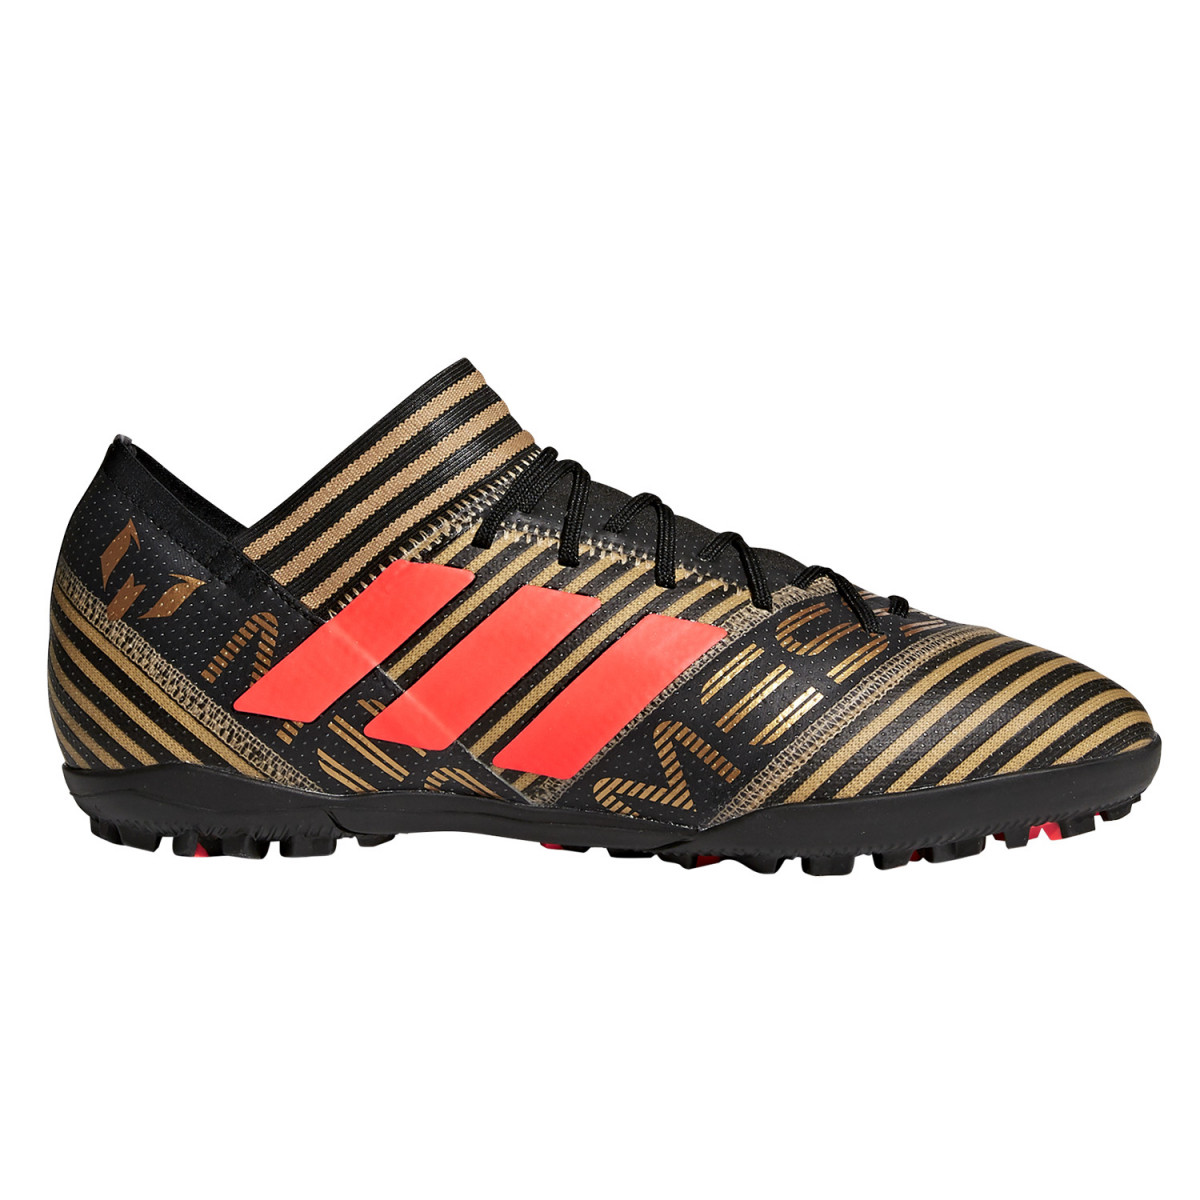 Botines Adidas Nemeziz Messi Tango 17.3 Tf